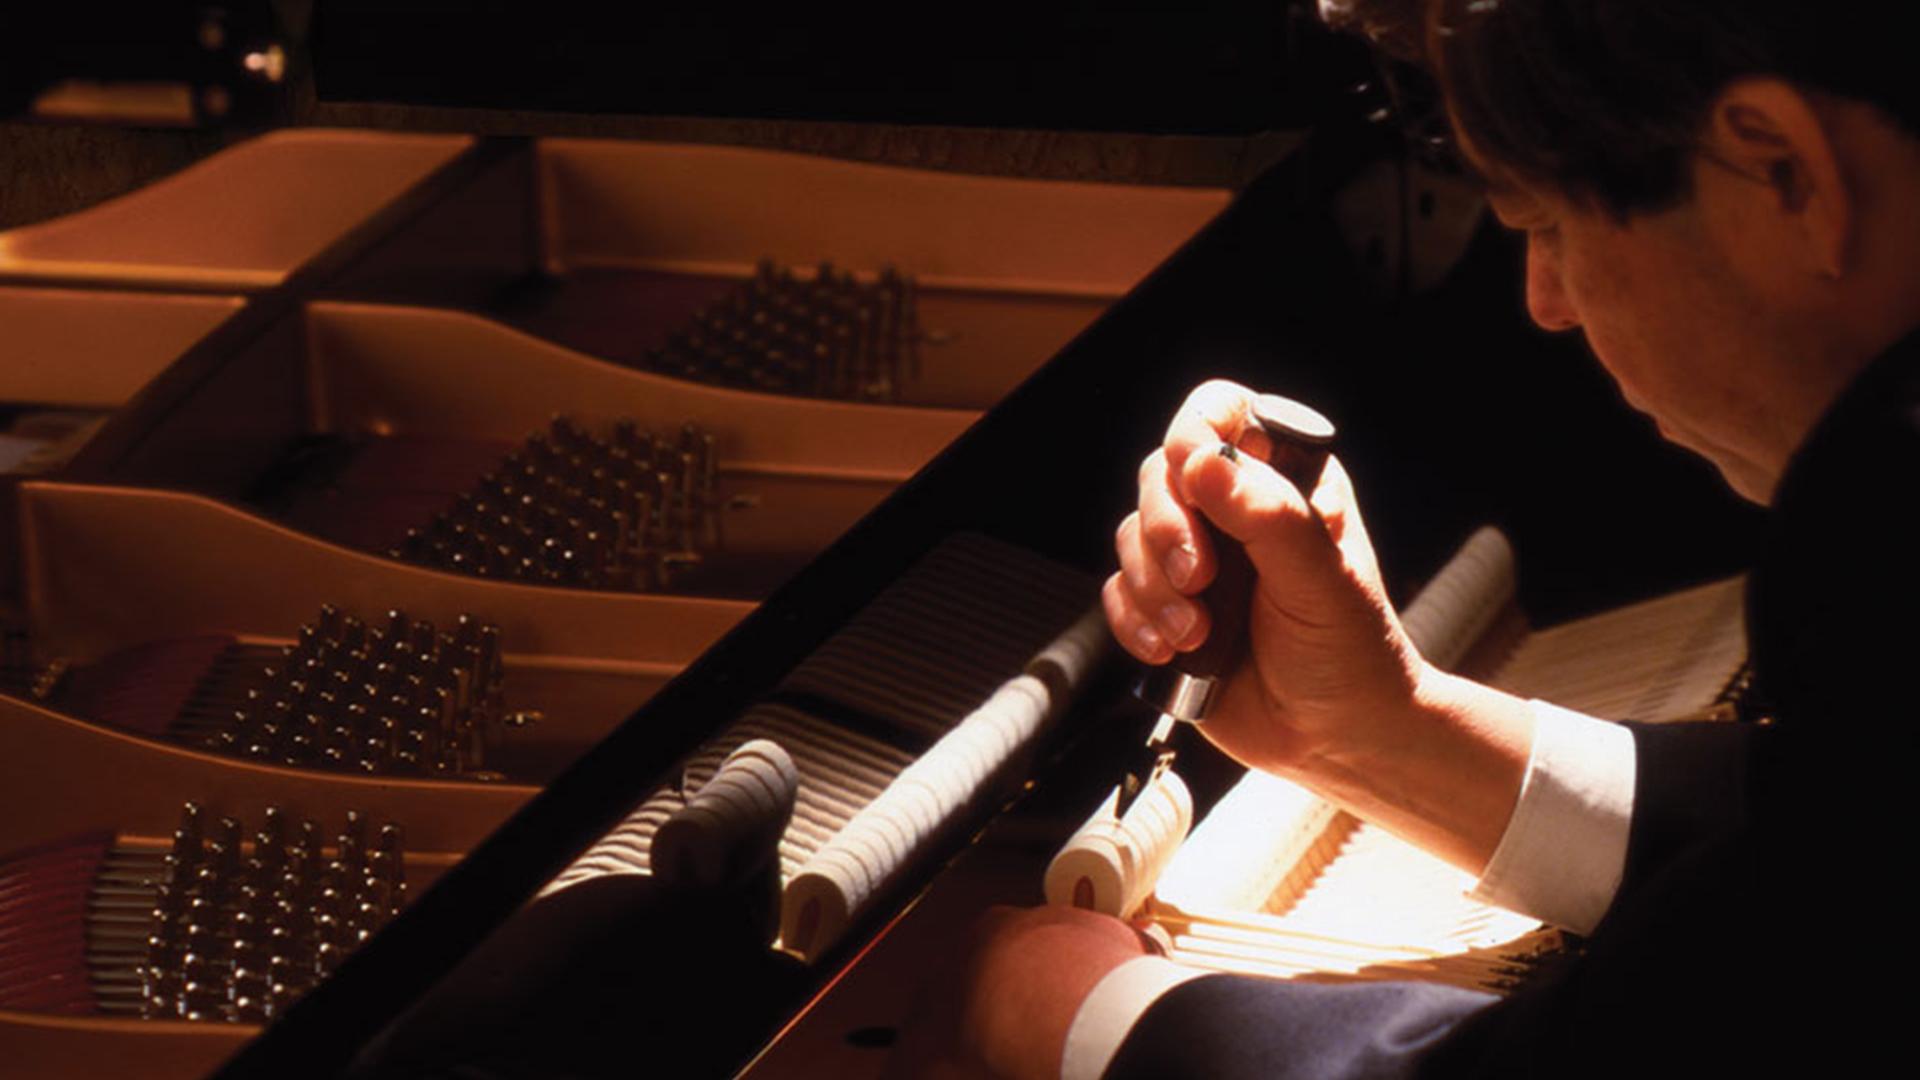 Master Piano Artisans